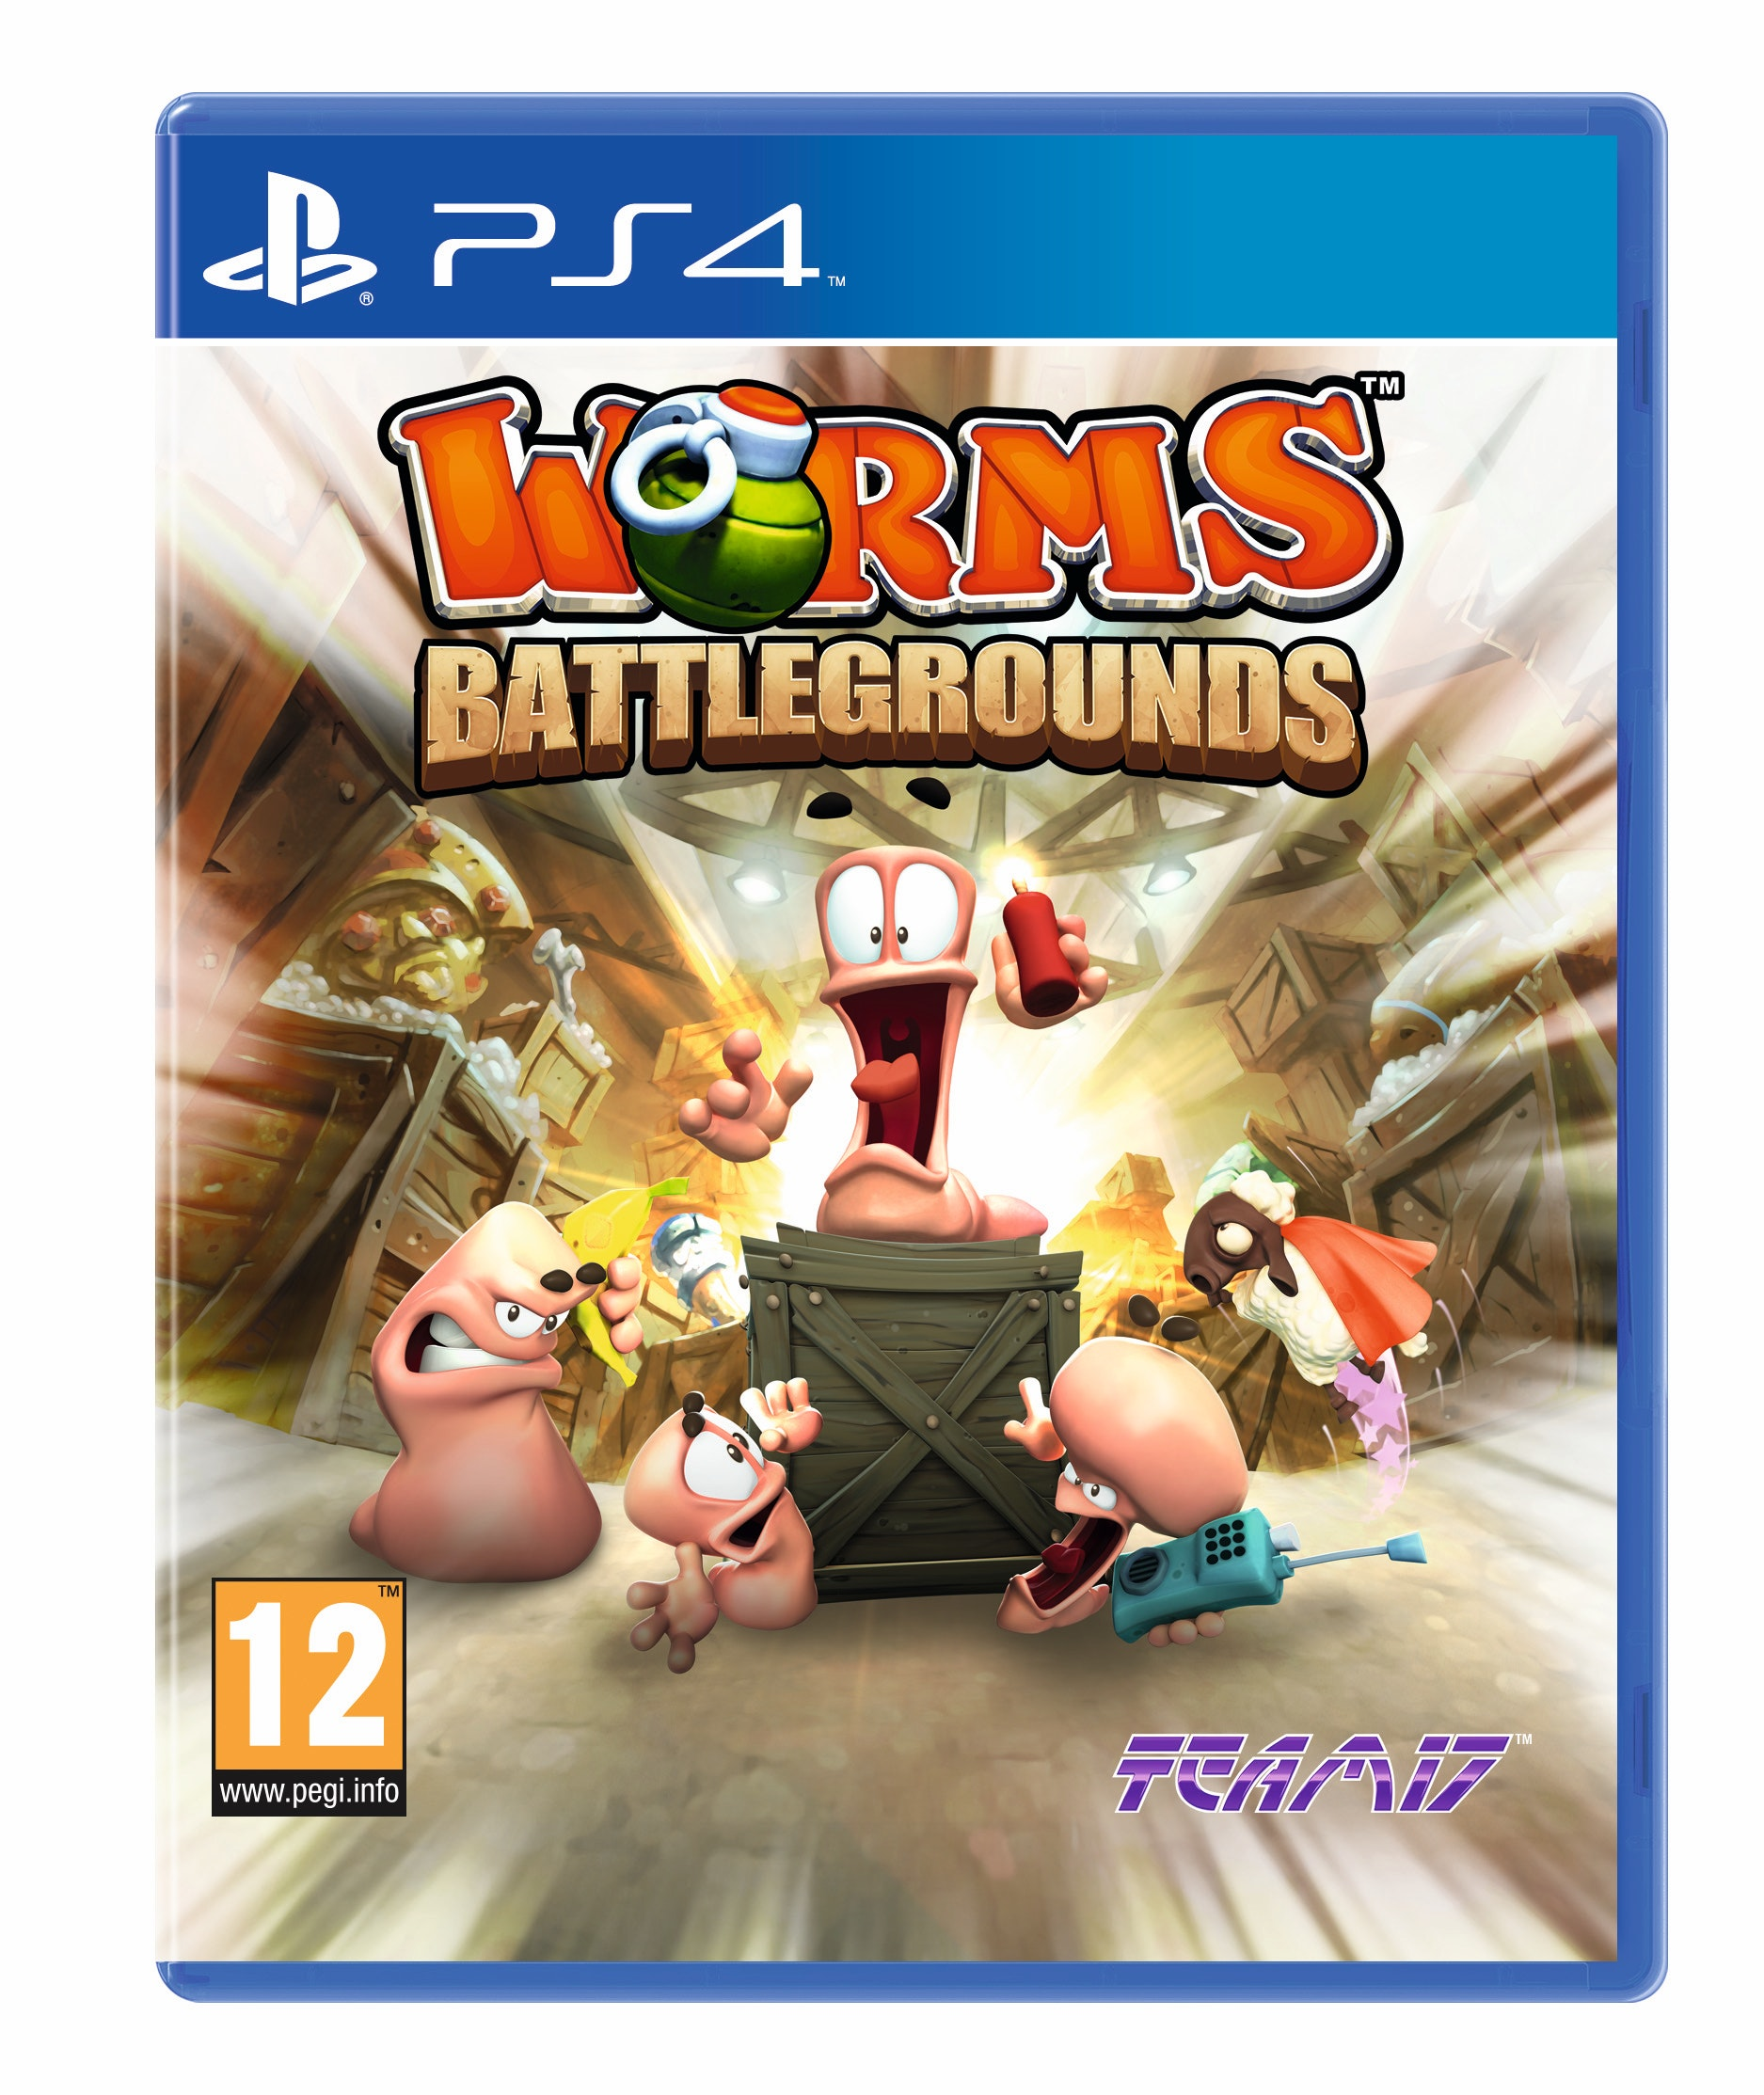 Wormsbattlegrounds 2d packshot pegihighres